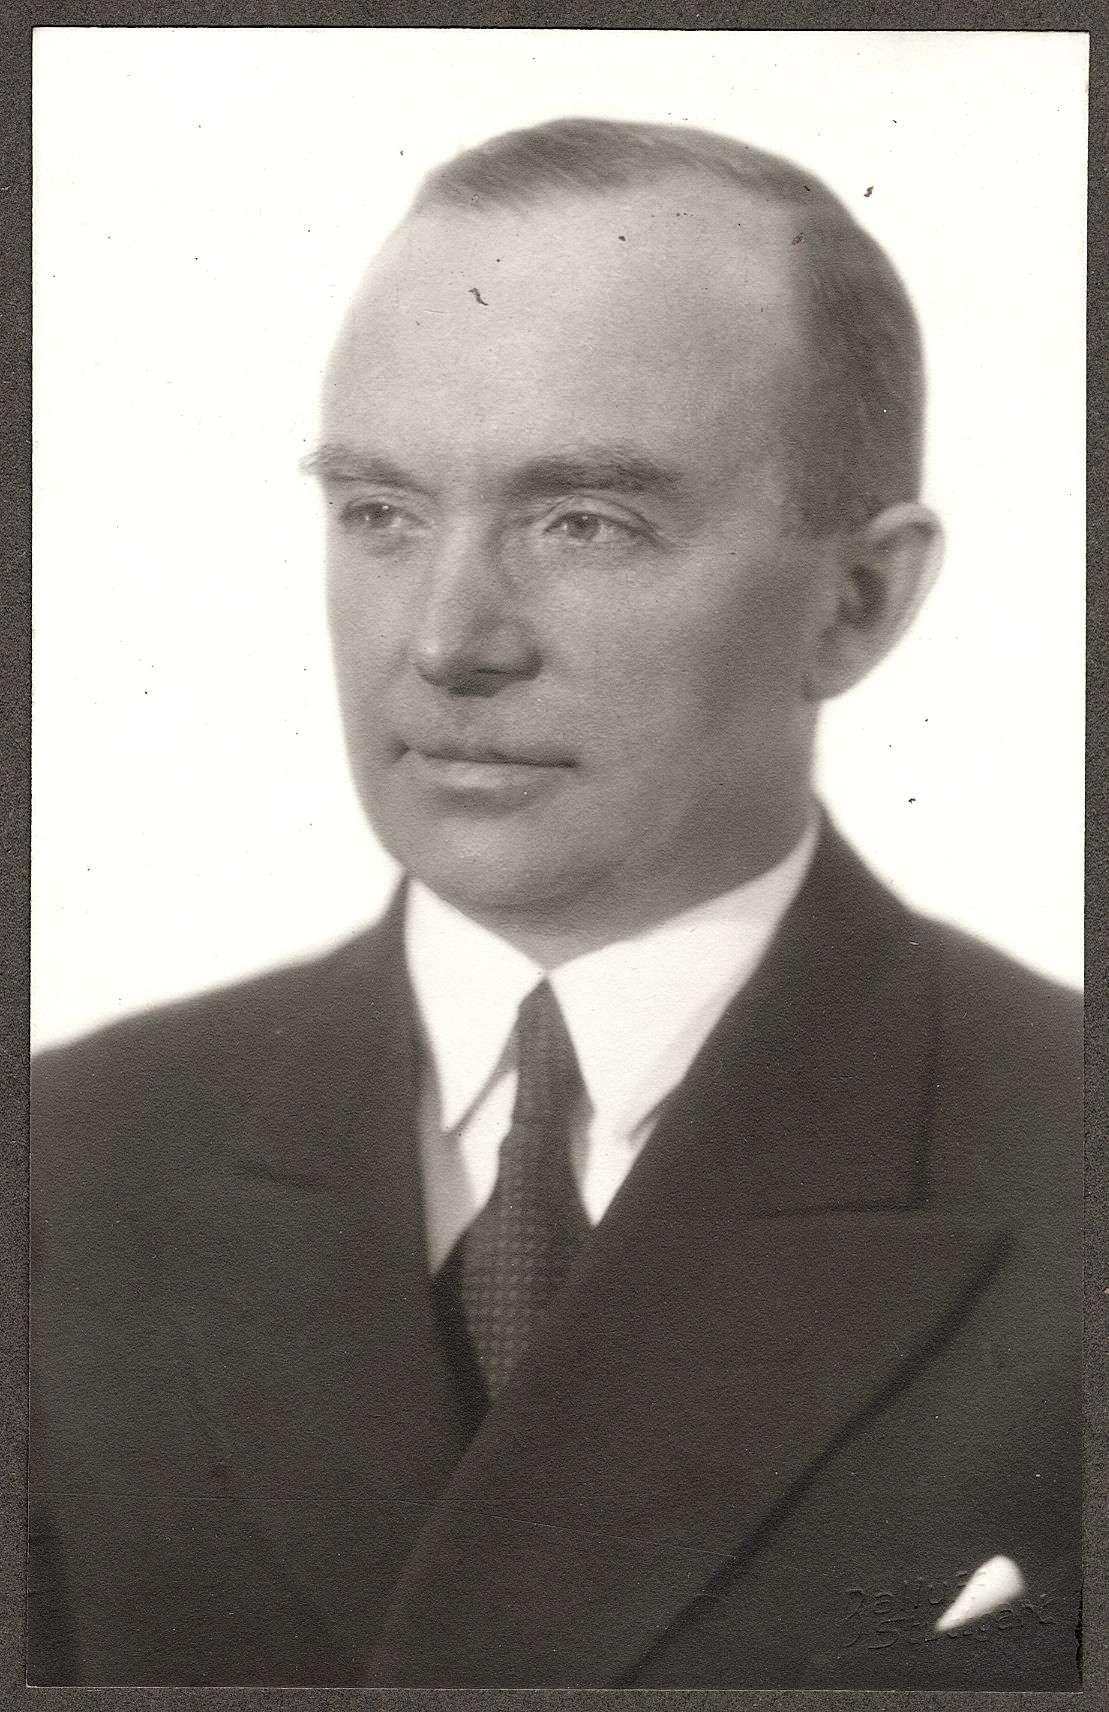 Haiges, Karl, Bild 1